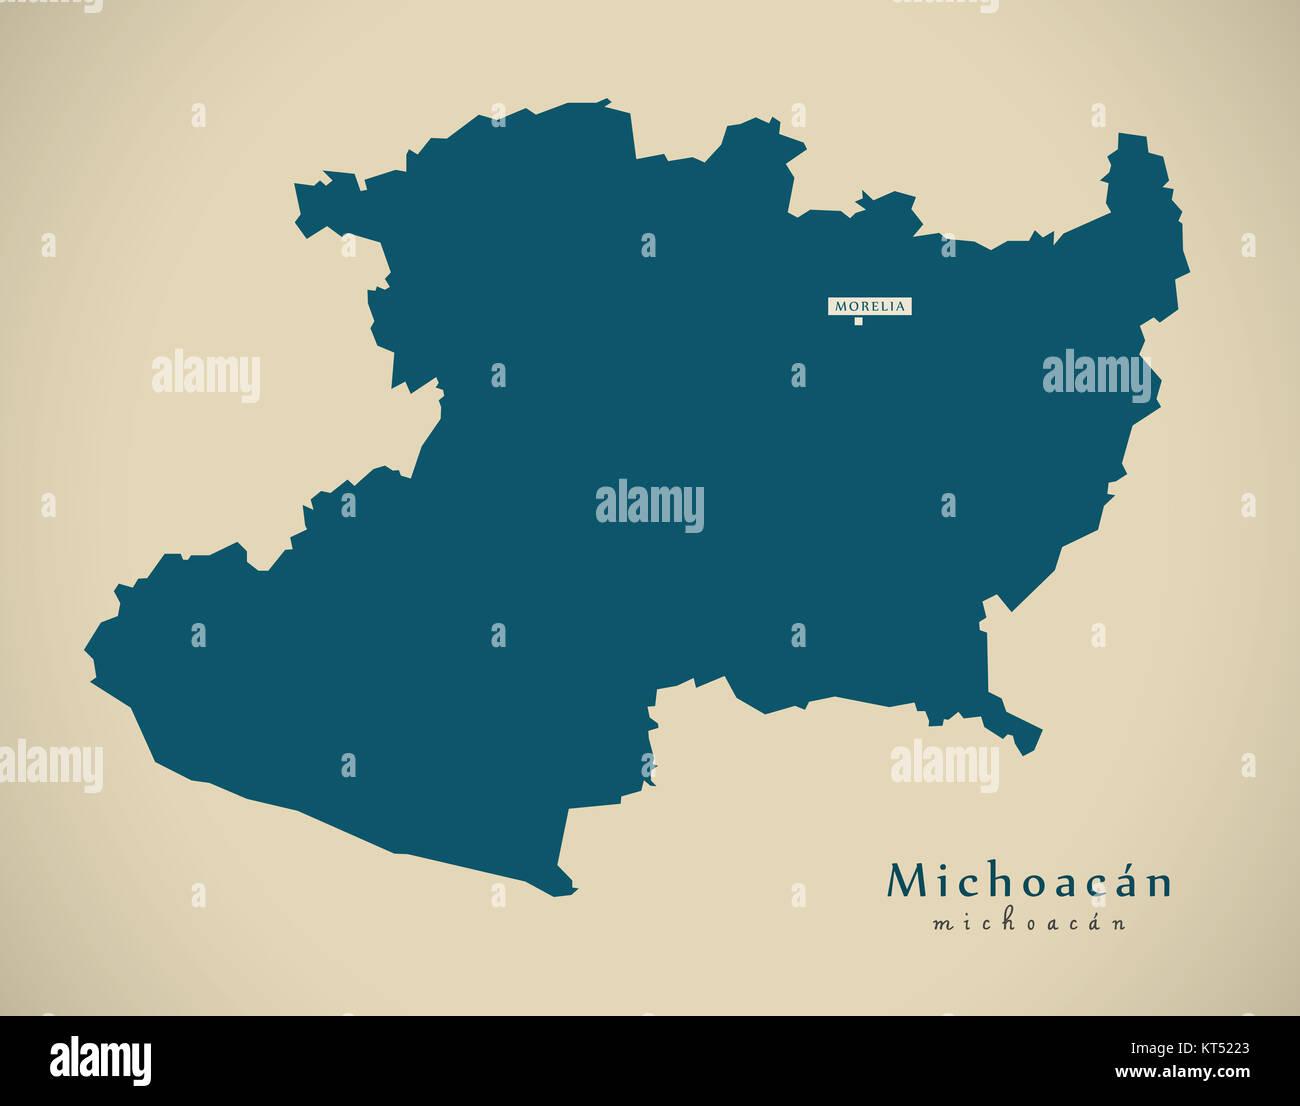 Modern Map Michoacan Mexico MX Illustration Stock Photo Royalty - Michoacan mexico map